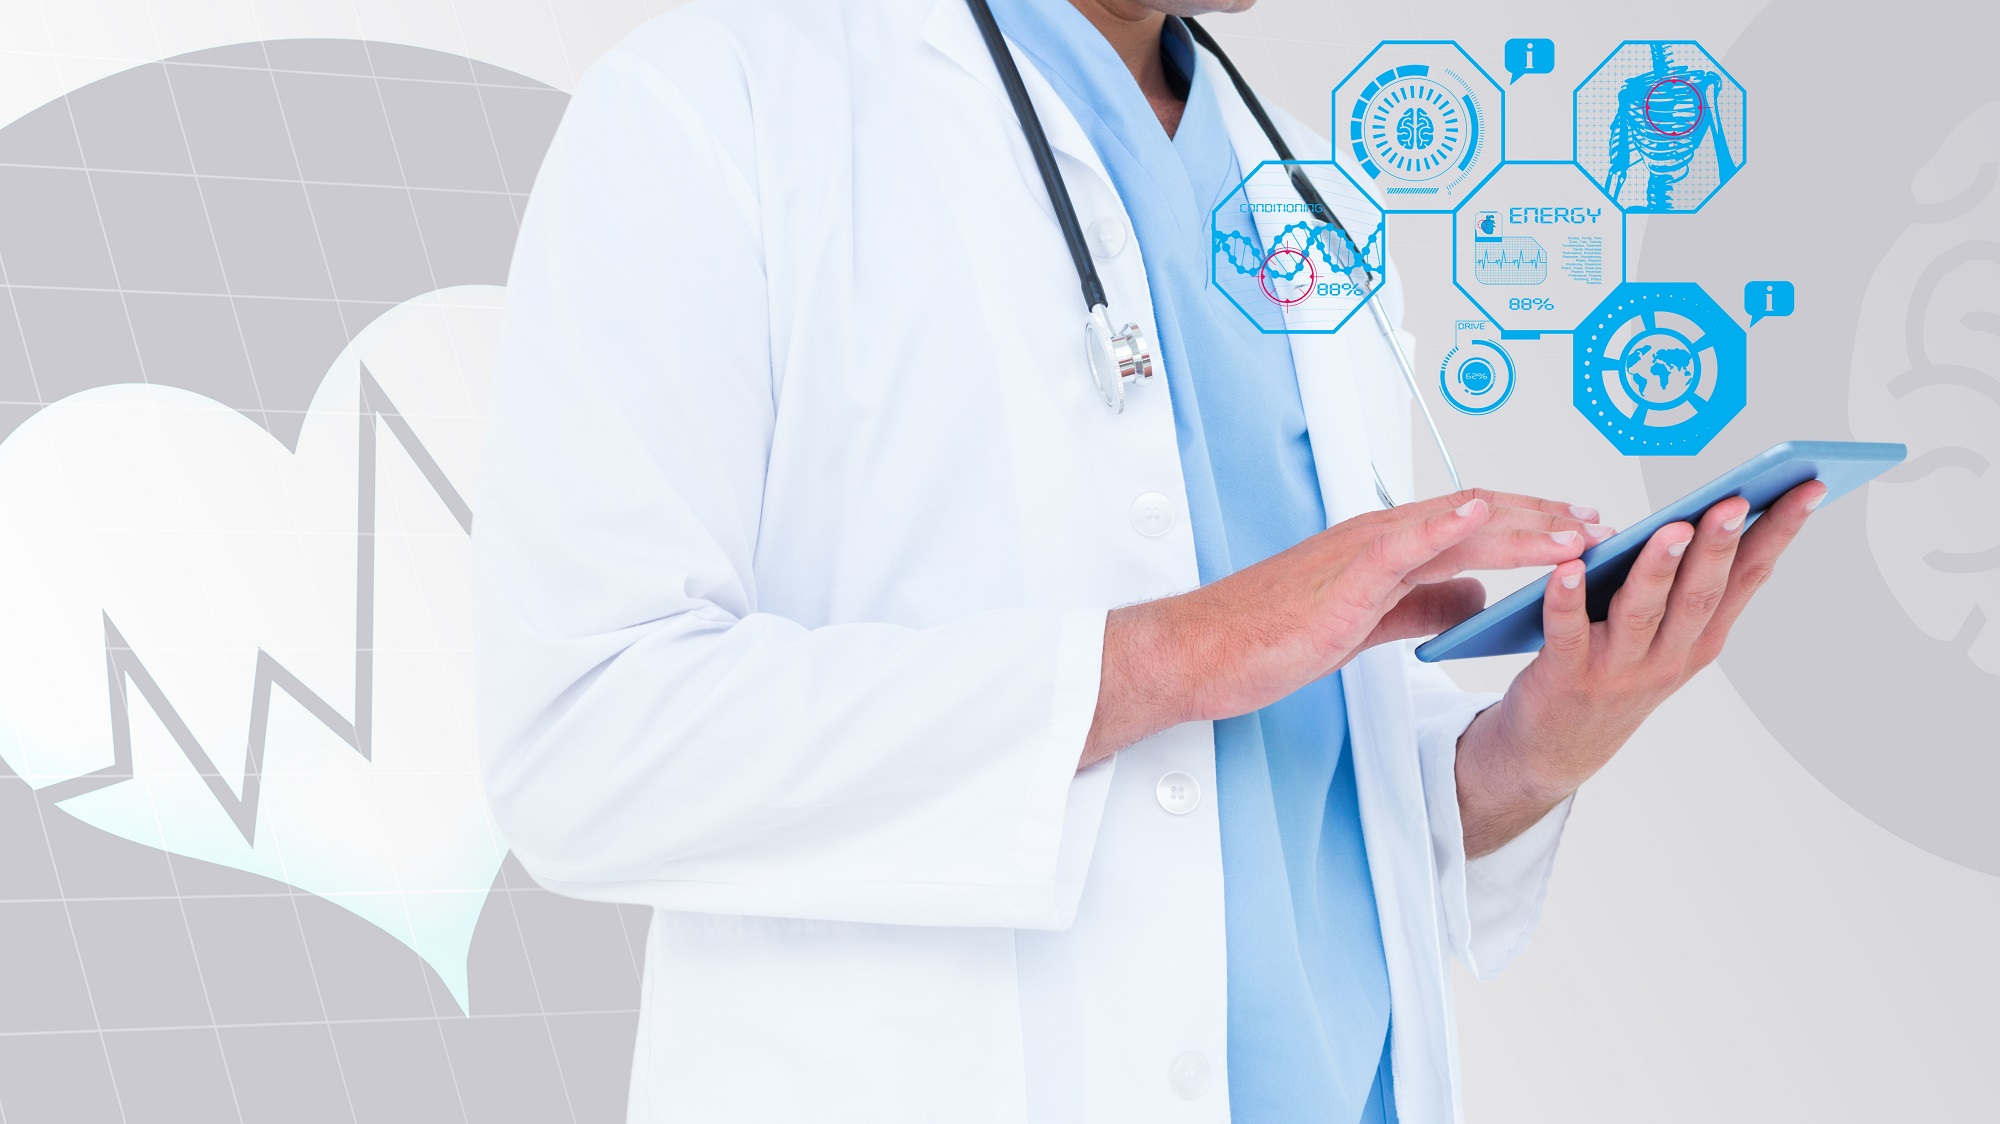 KSA Vision 2030 represents shift in Saudi healthcare